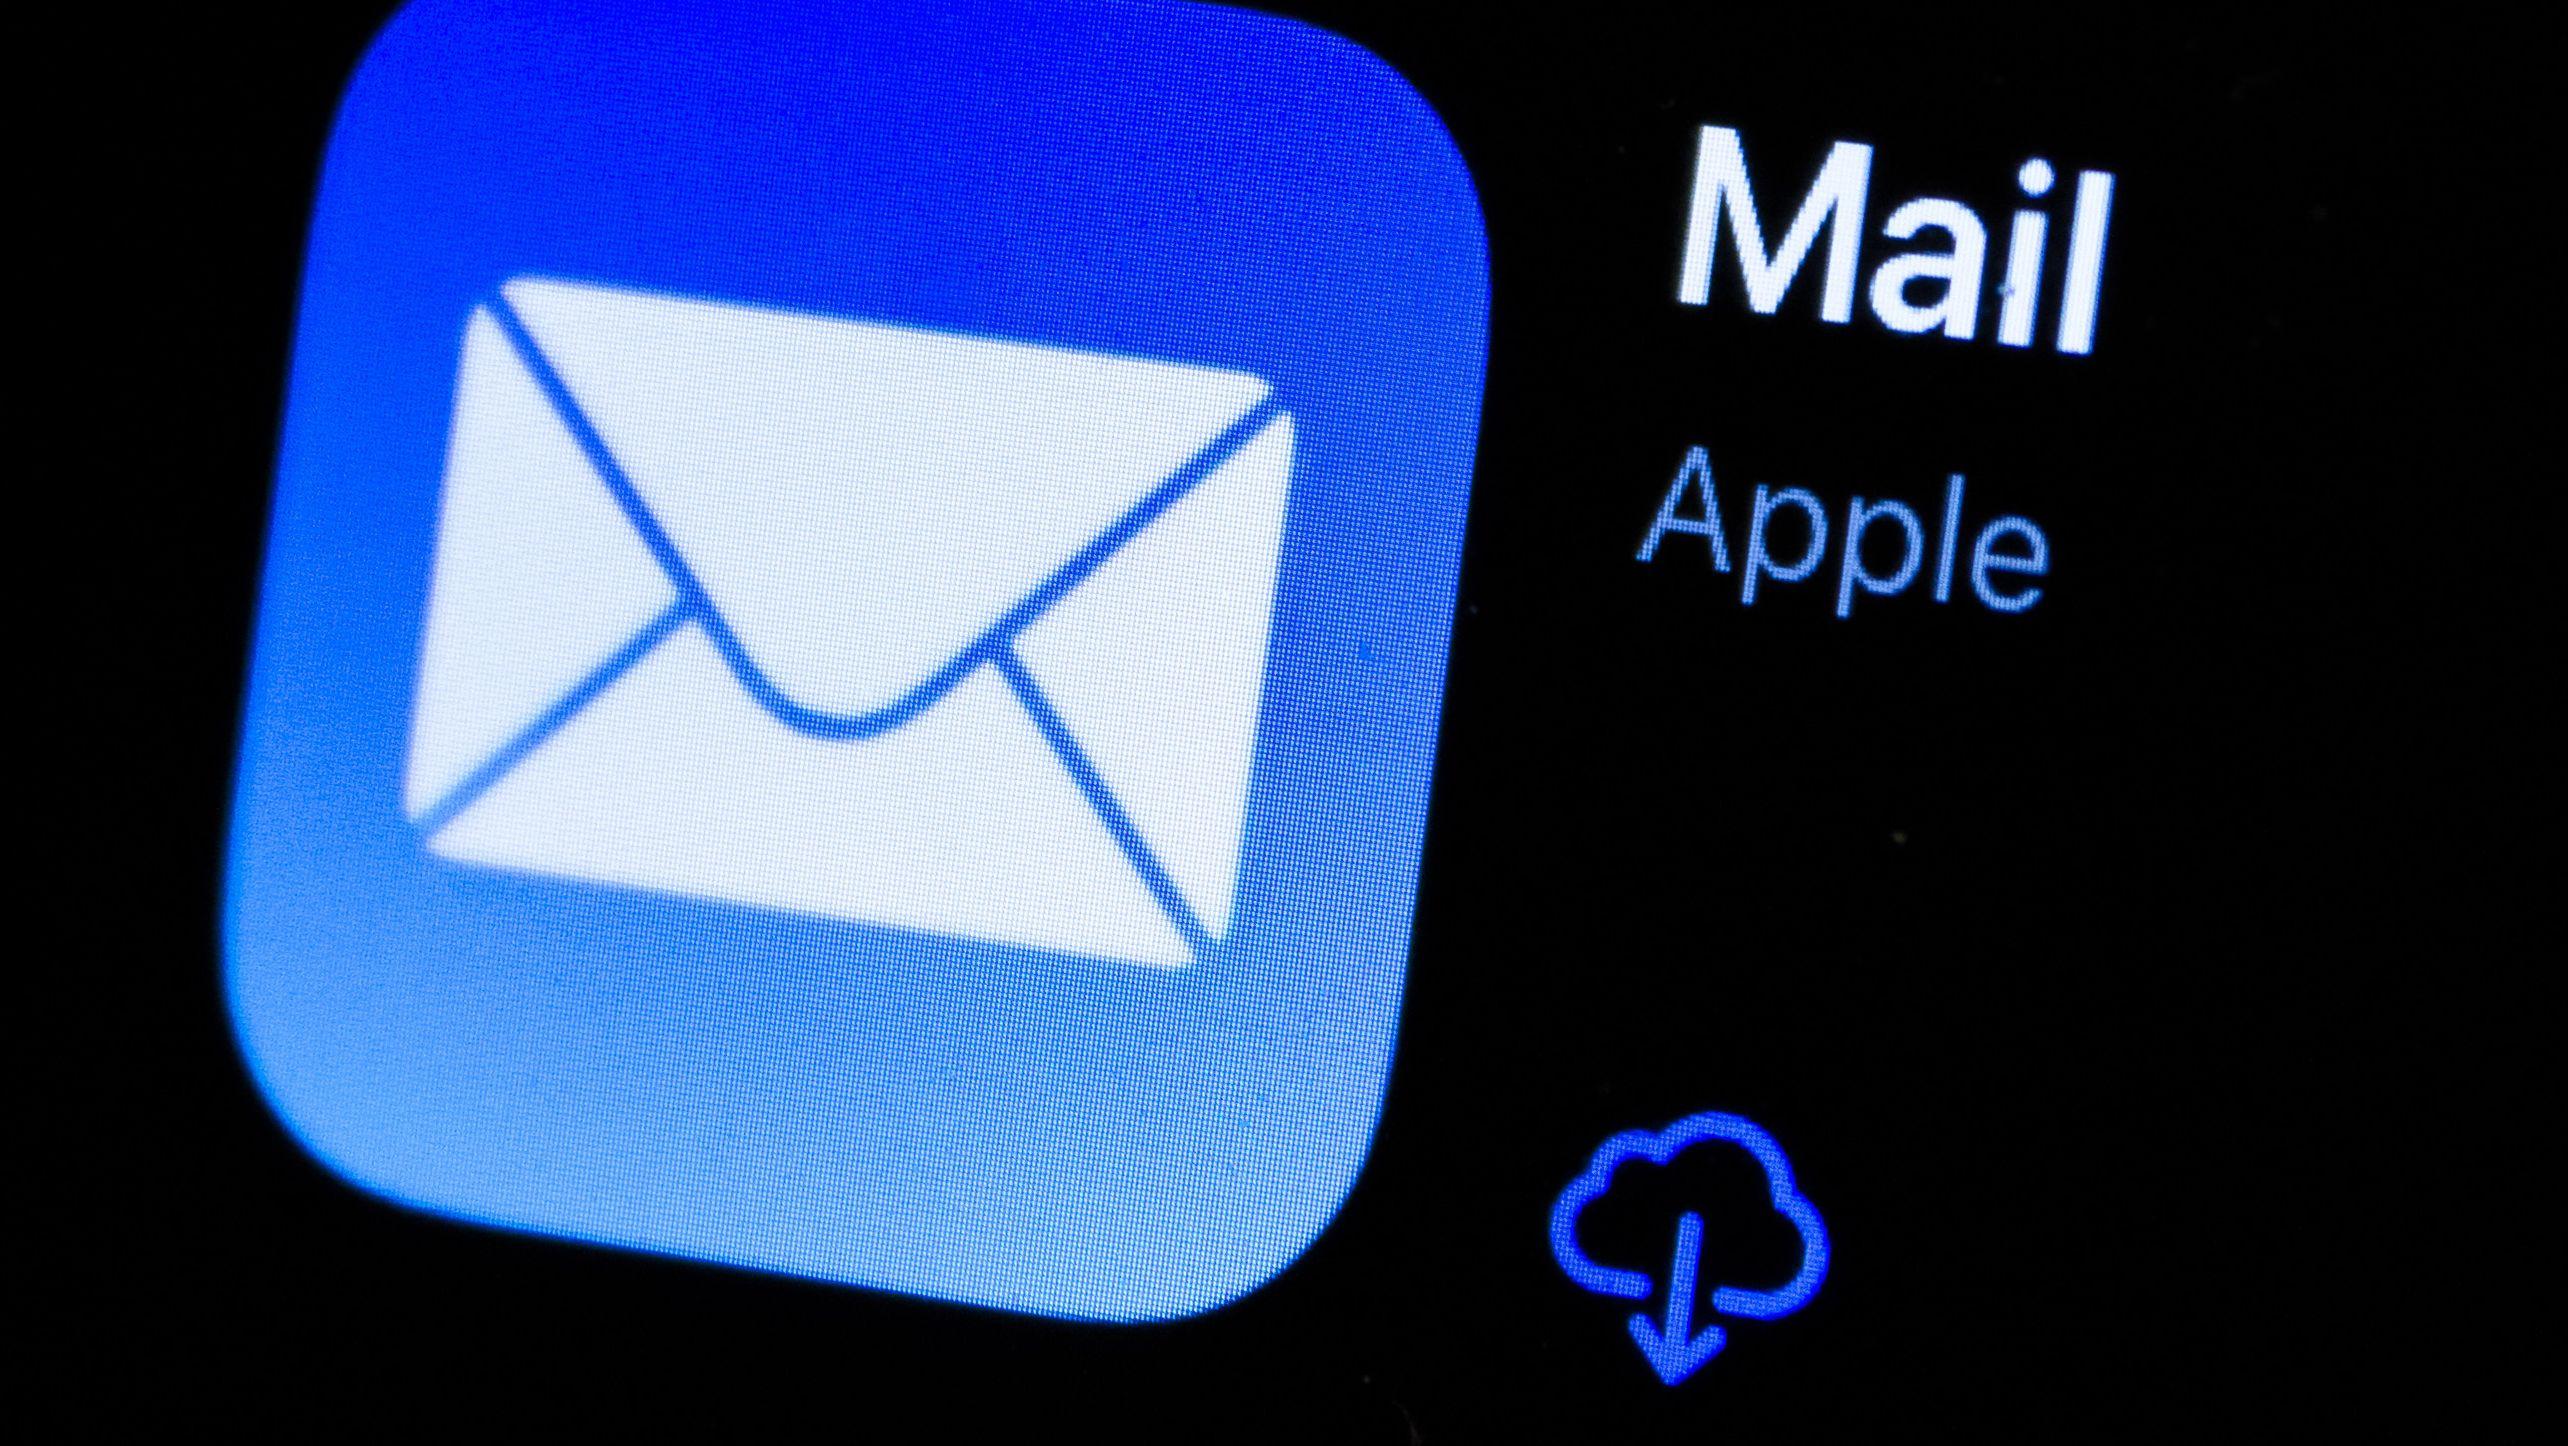 App-Symbol der Apple Mail App